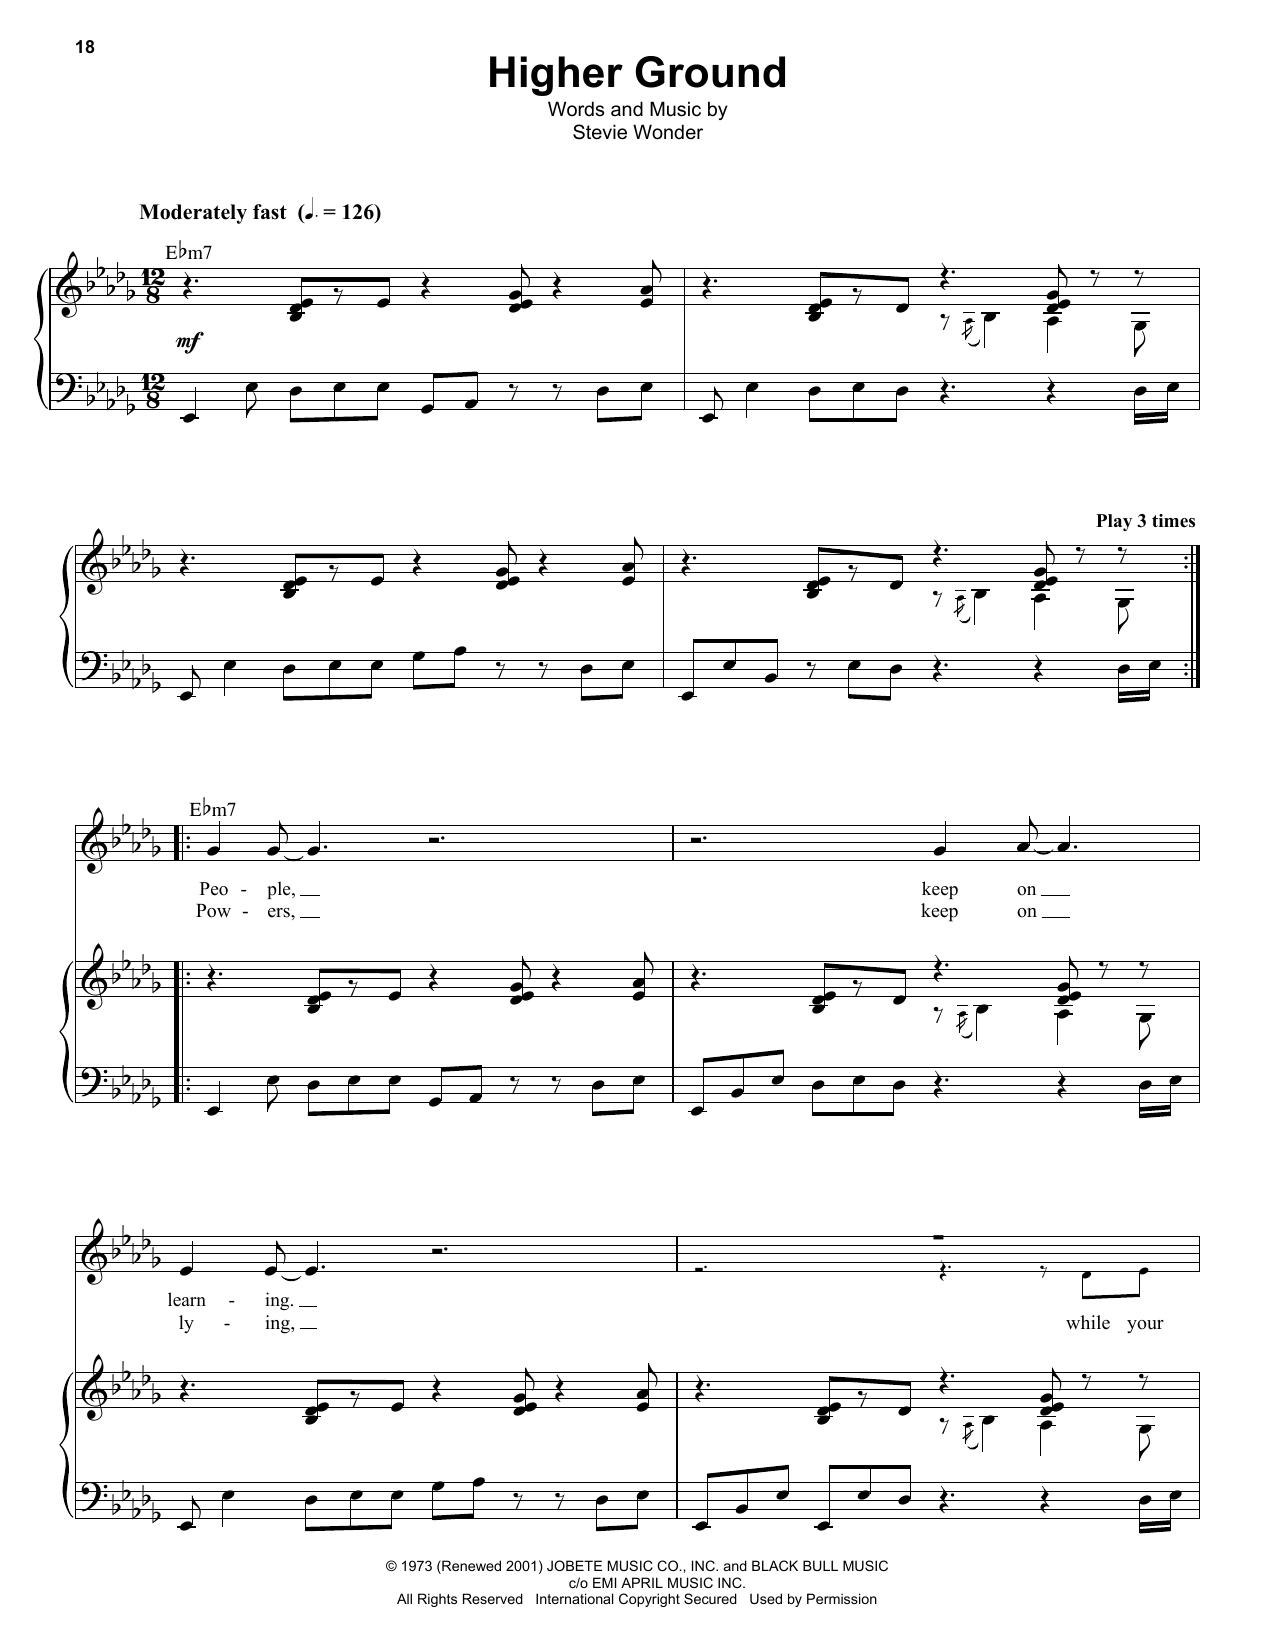 Higher Ground Sheet Music By Stevie Wonder Keyboard Transcription